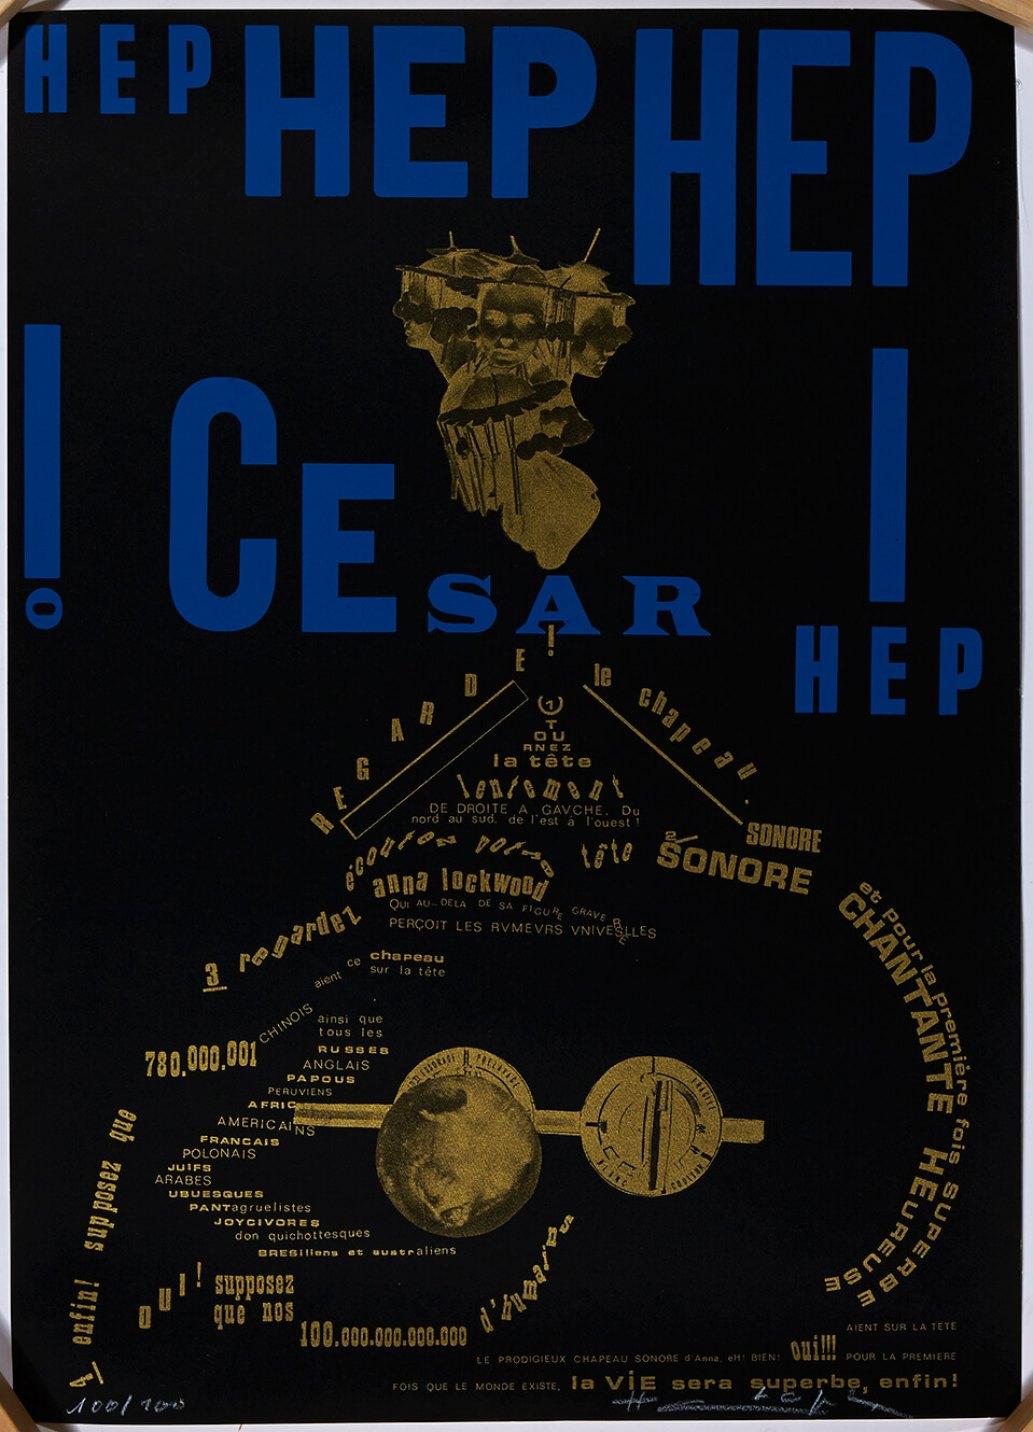 Henri Chopin,&nbsp;<em>Hep Hep Hep Cesar!</em>, 1970,&nbsp;color print on paper, crayon,&nbsp;70 × 50 cm - Mendes Wood DM